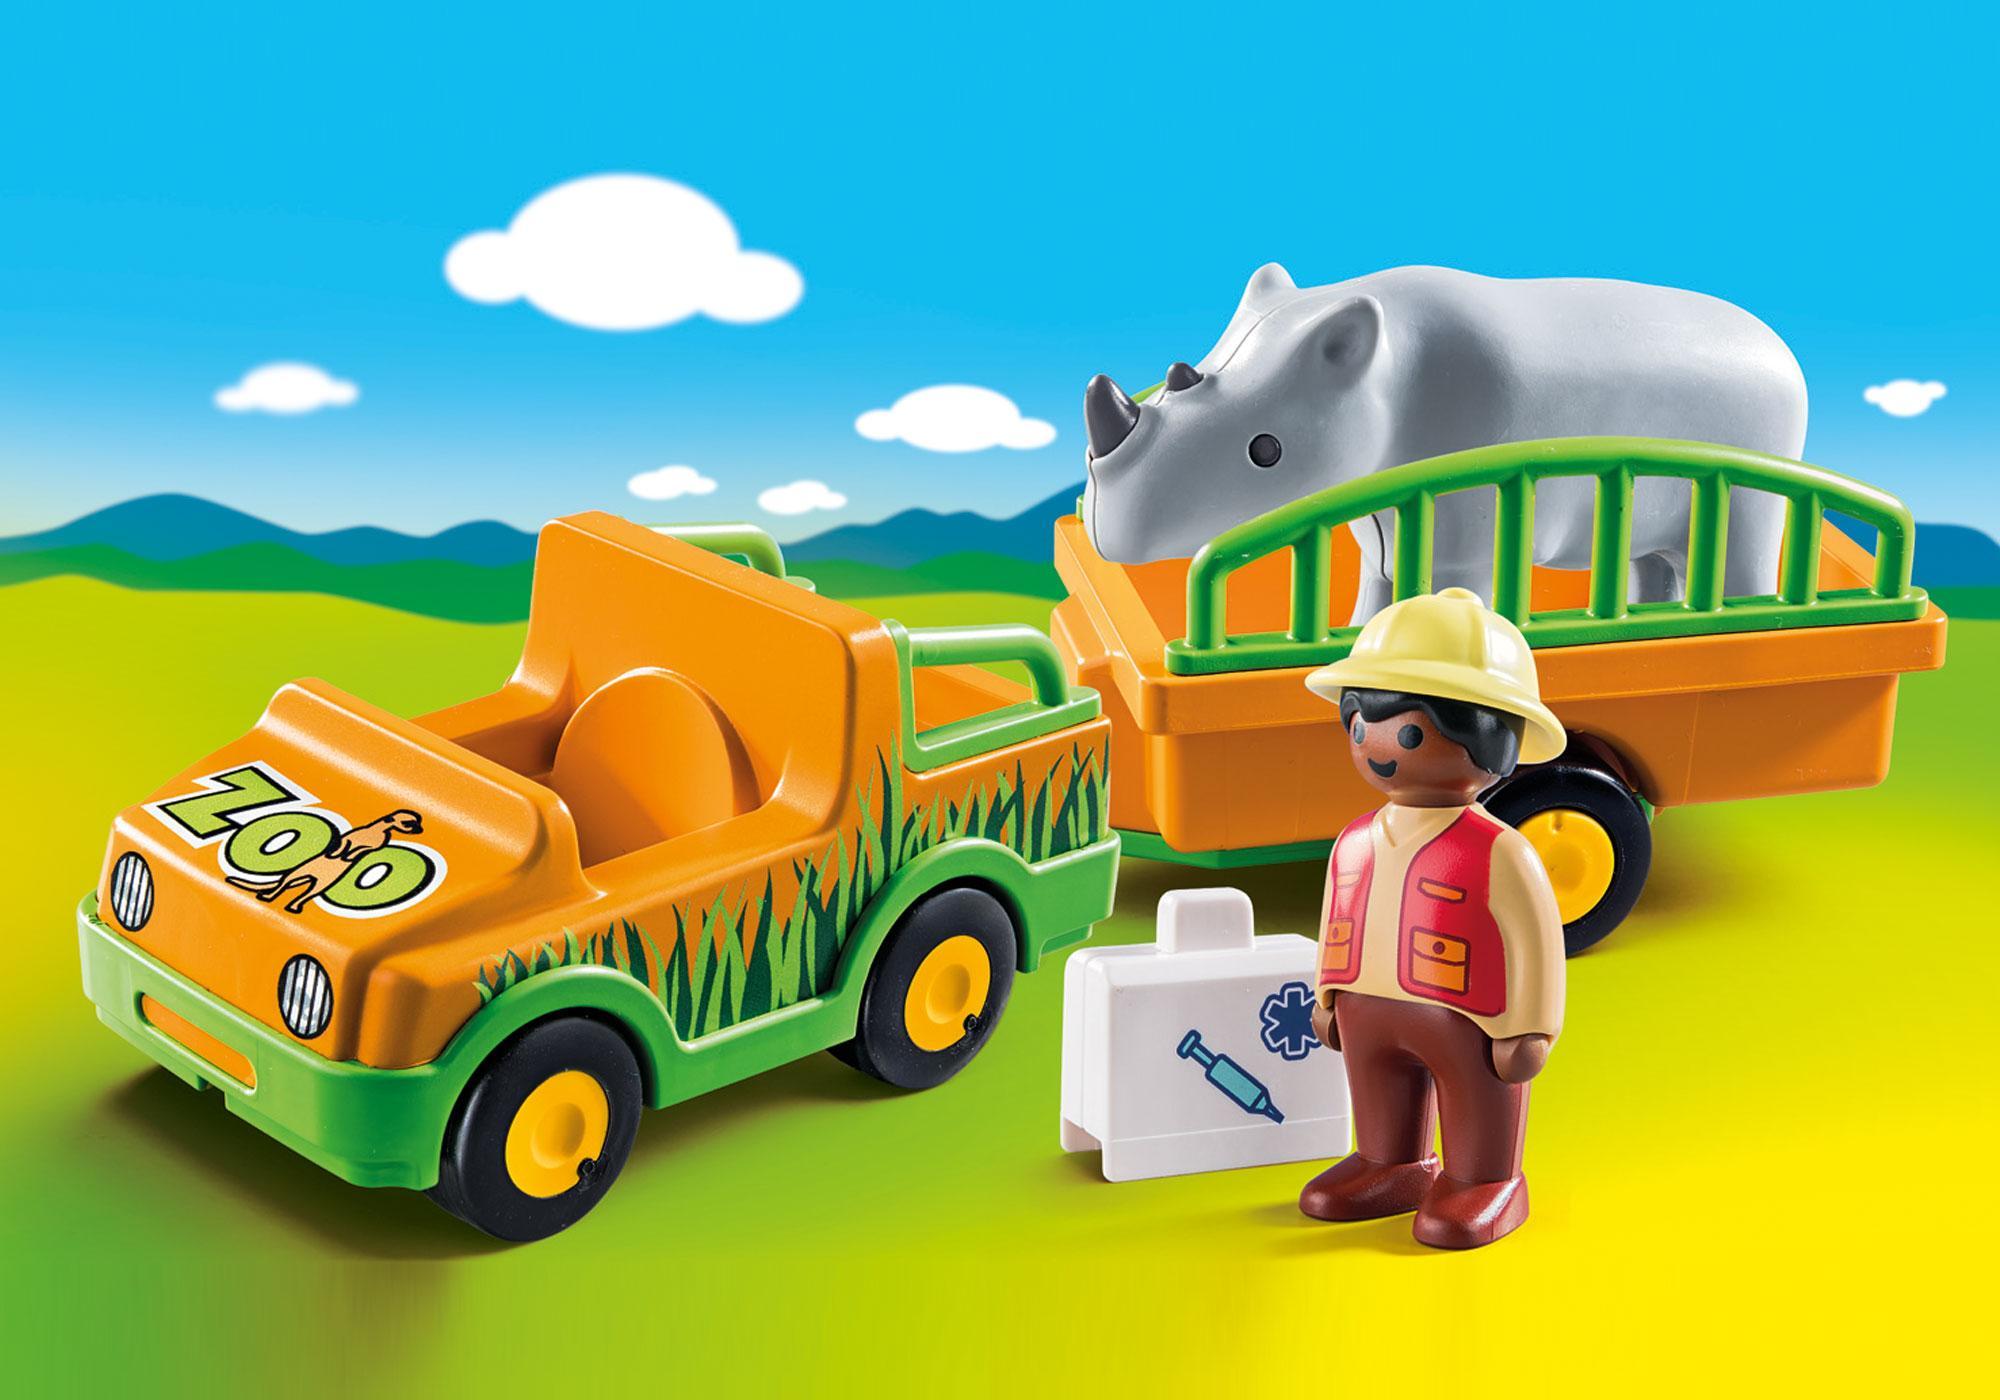 http://media.playmobil.com/i/playmobil/70182_product_detail/Zoofahrzeug mit Nashorn